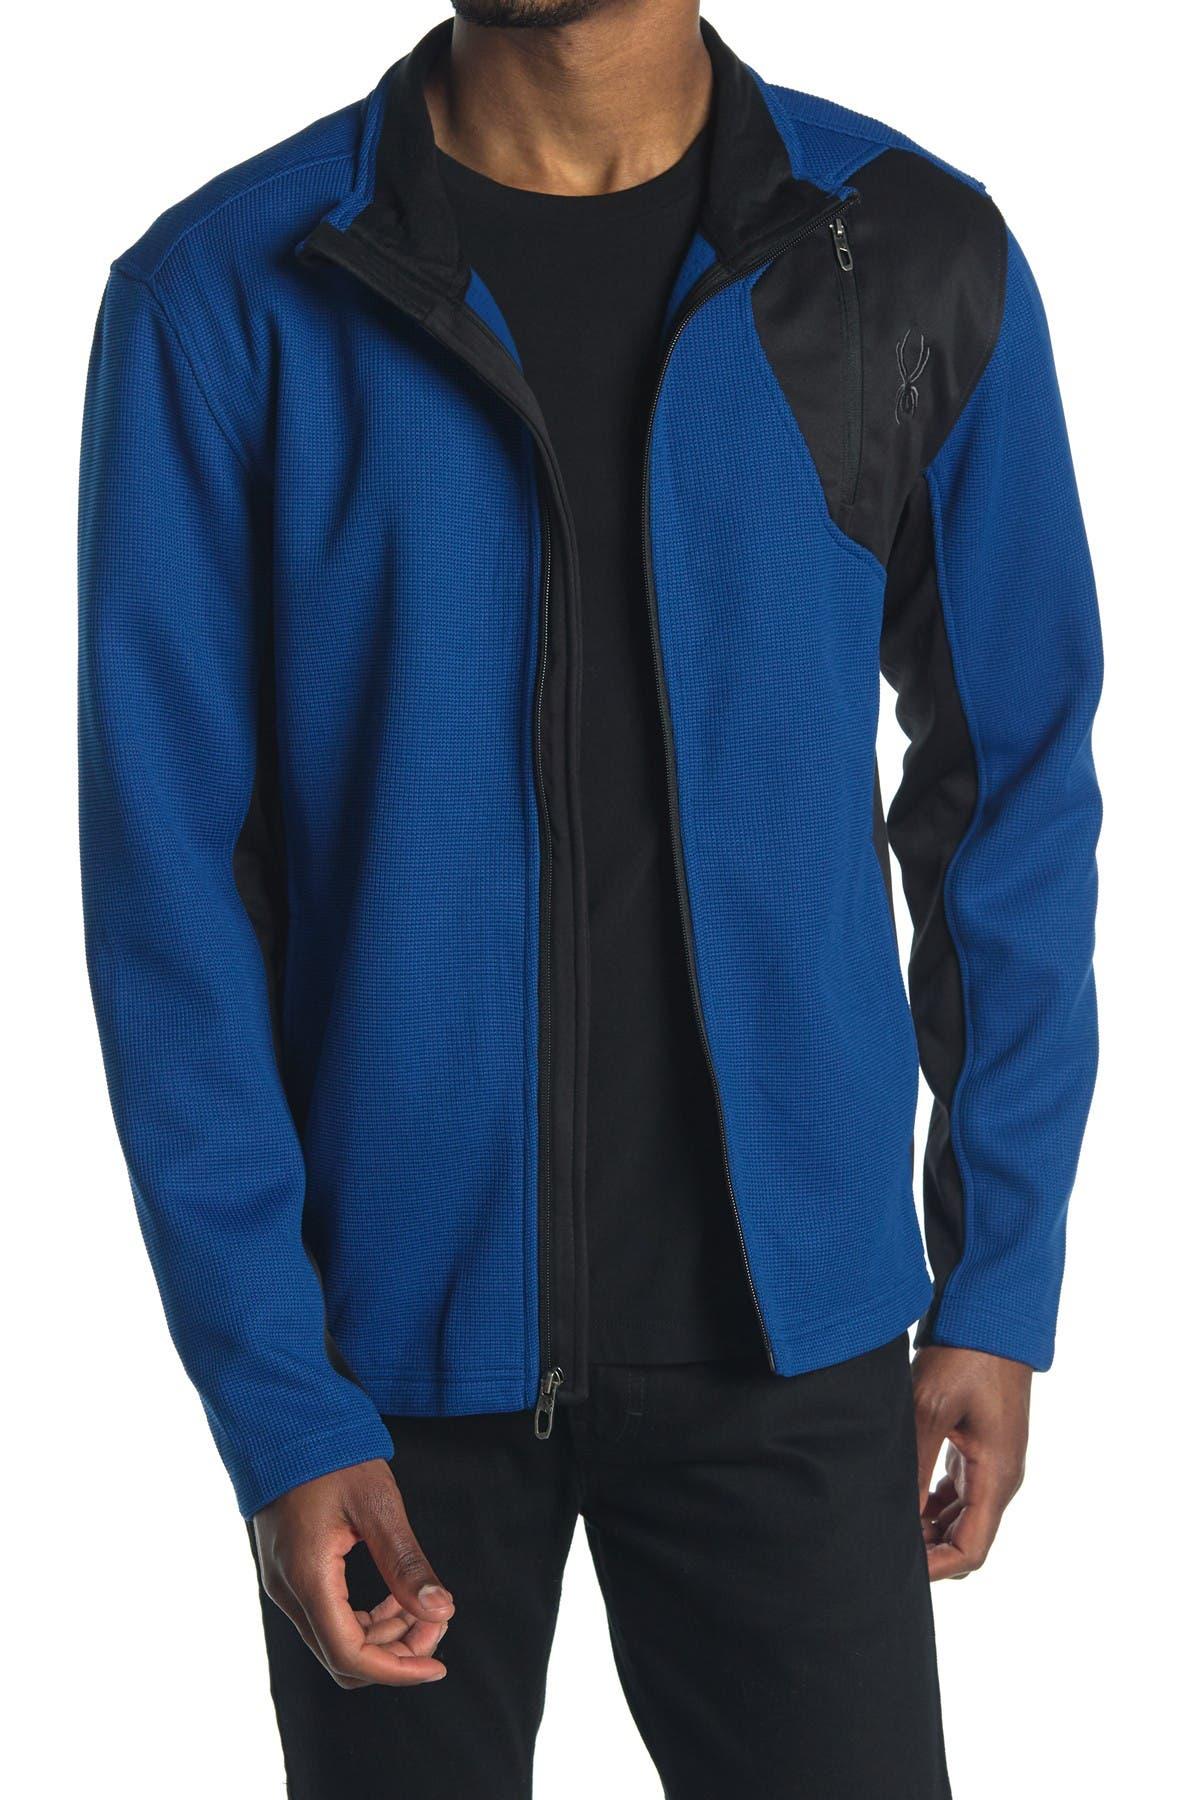 Image of SPYDER Raider Full Zip Front Jacket